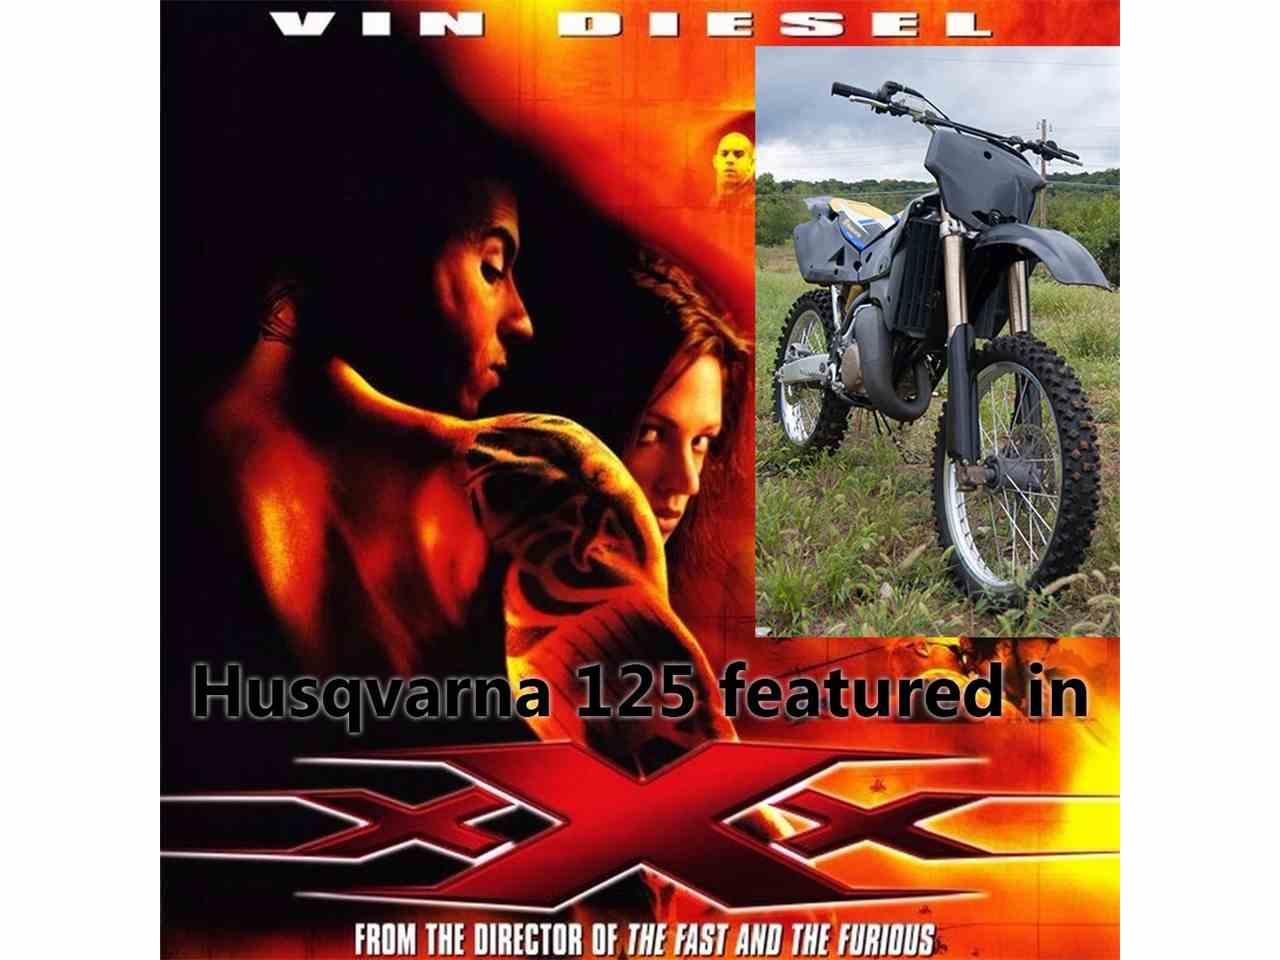 2001 Husqvarna CR125 for Sale - CC-725813